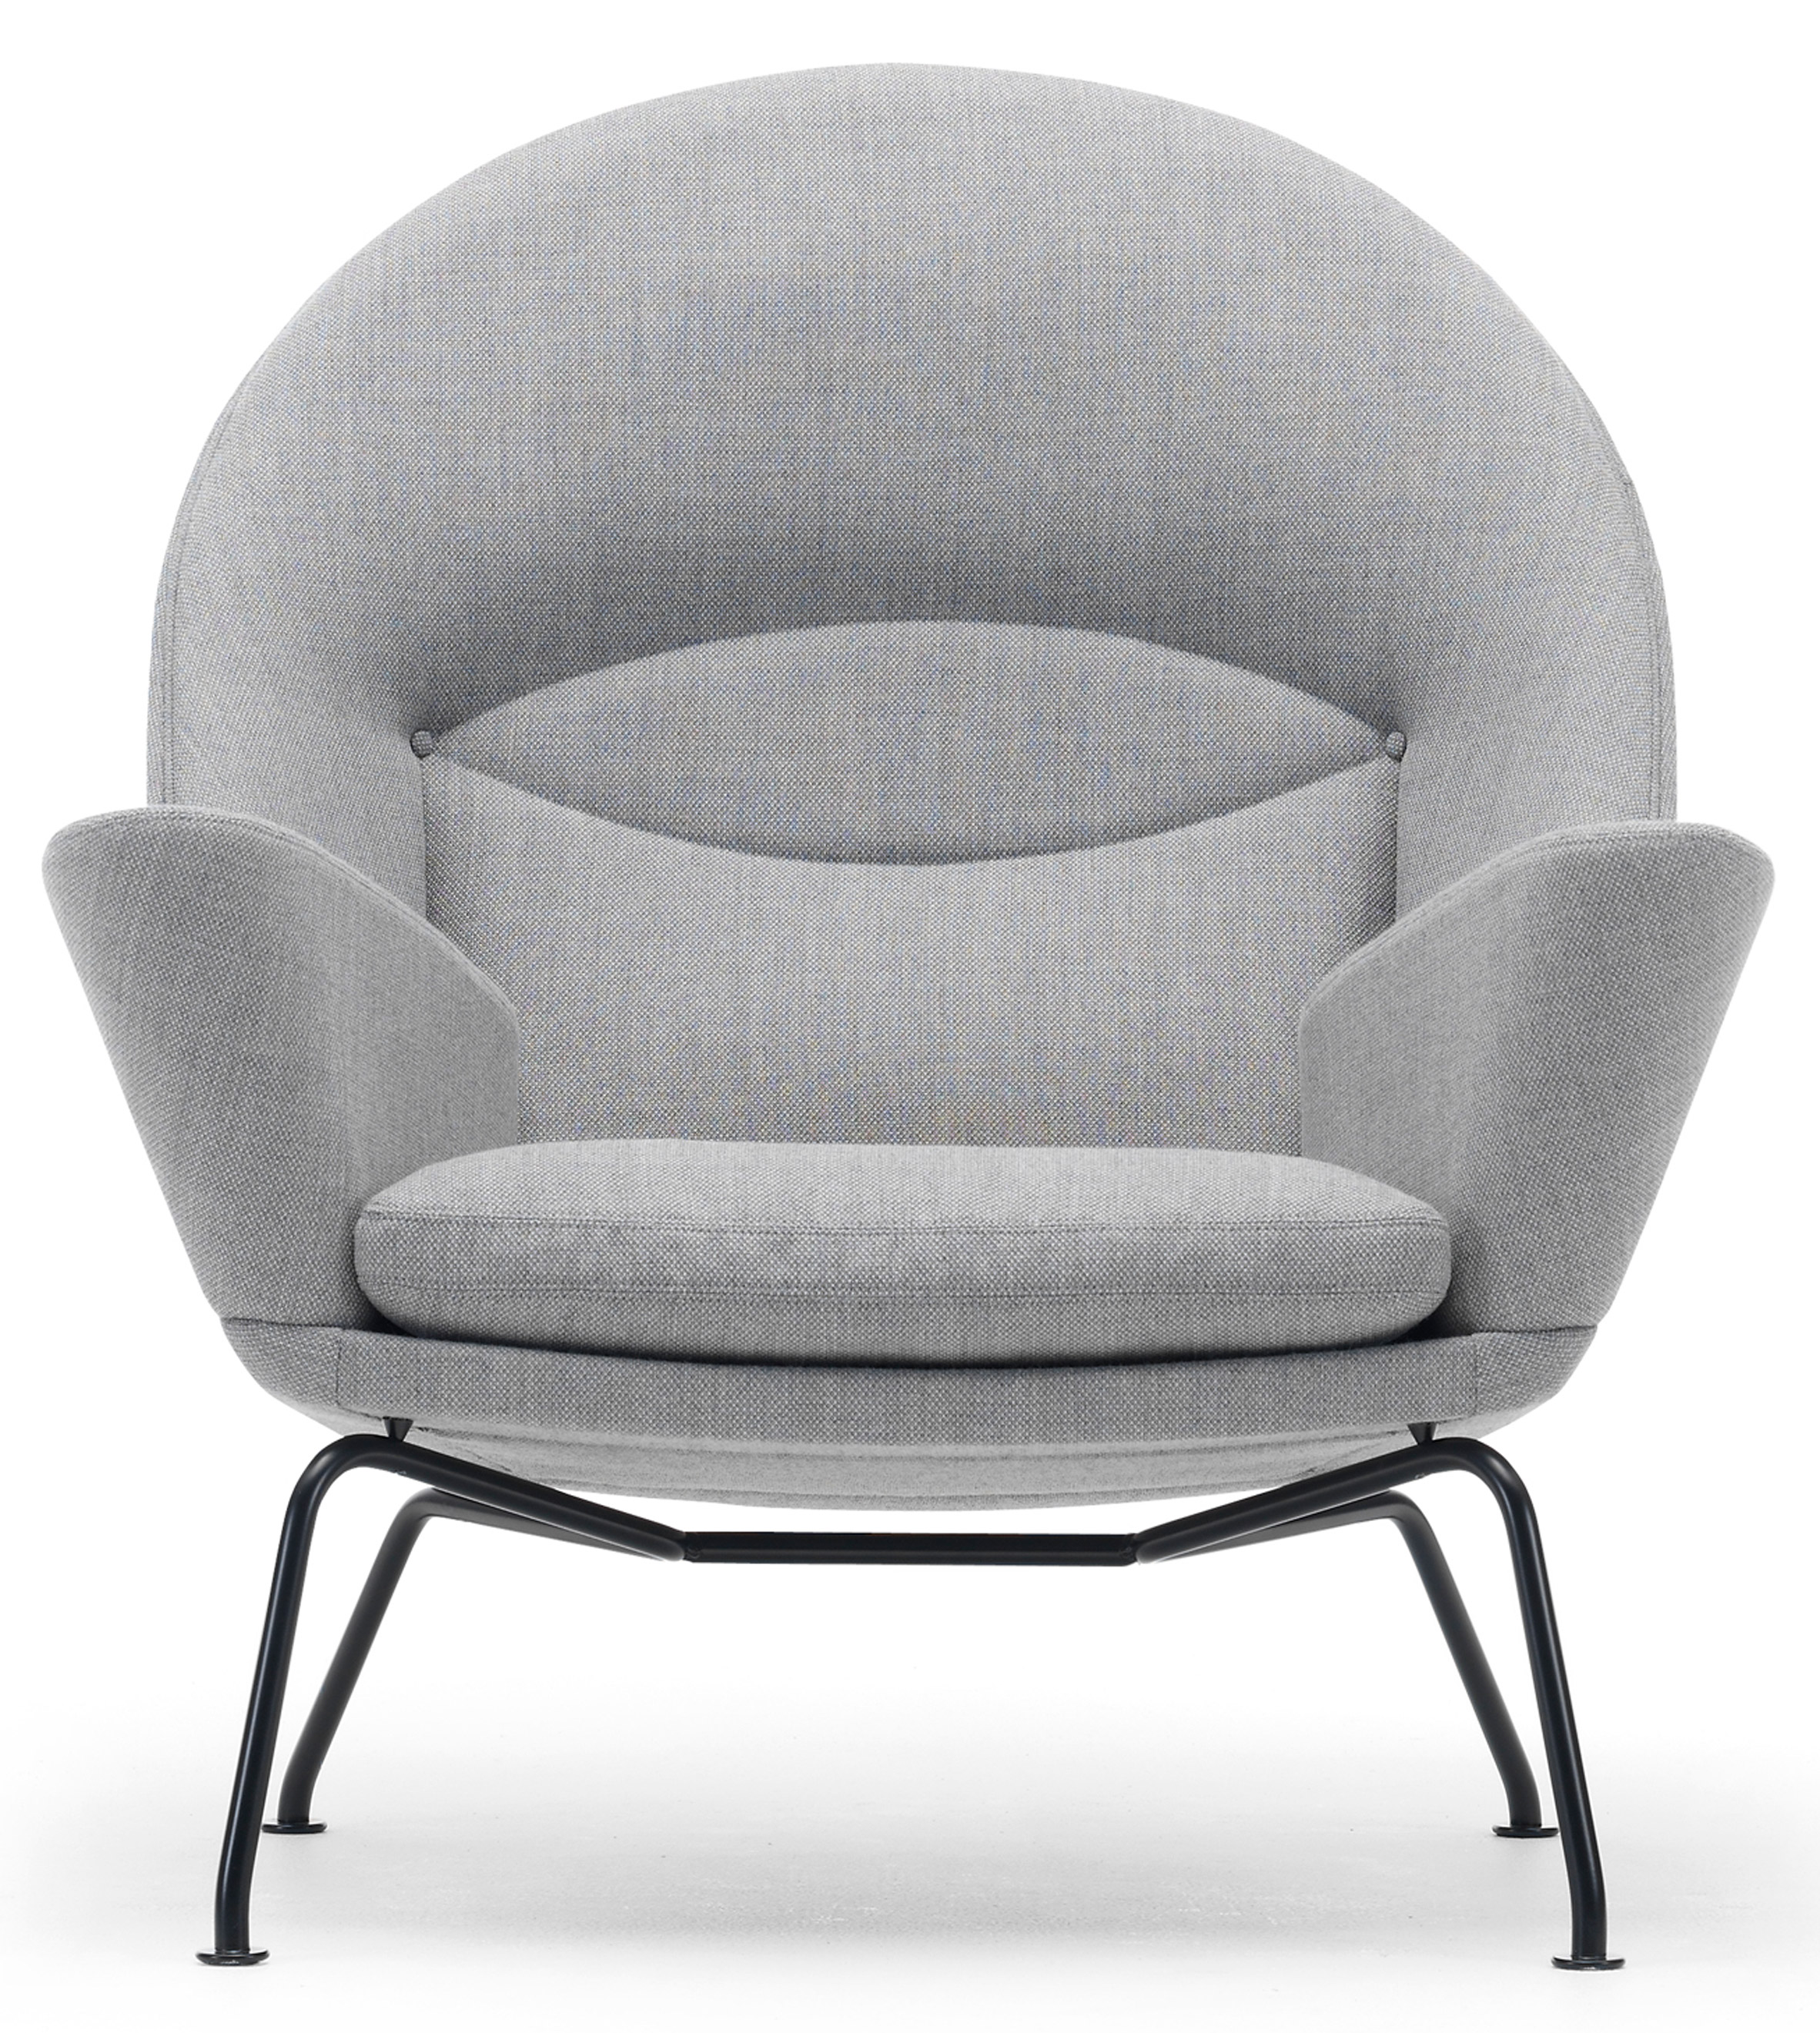 Carl Hansen & Søn adds black frame to Hans J Wegner lounge chairs